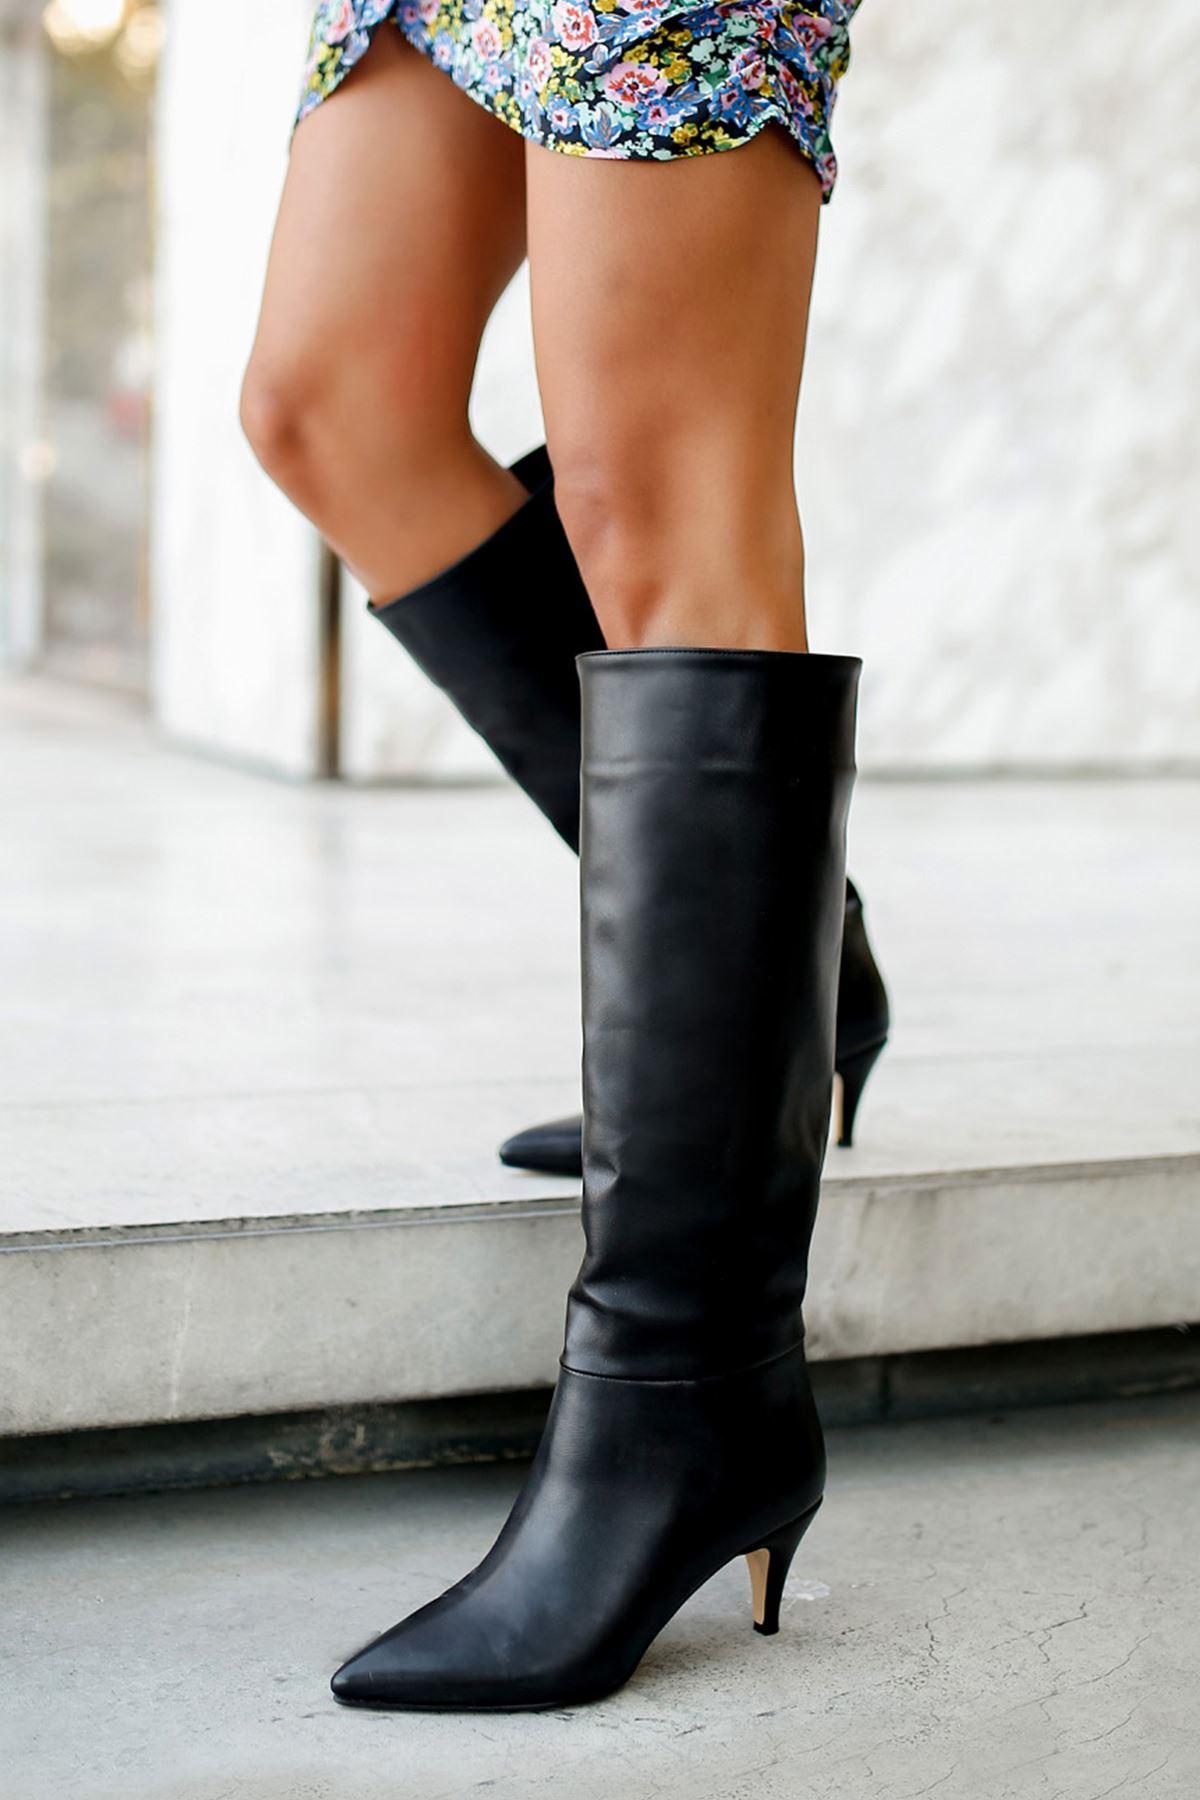 Vanetto Kadın Deri Topuklu Çizme-Siyah